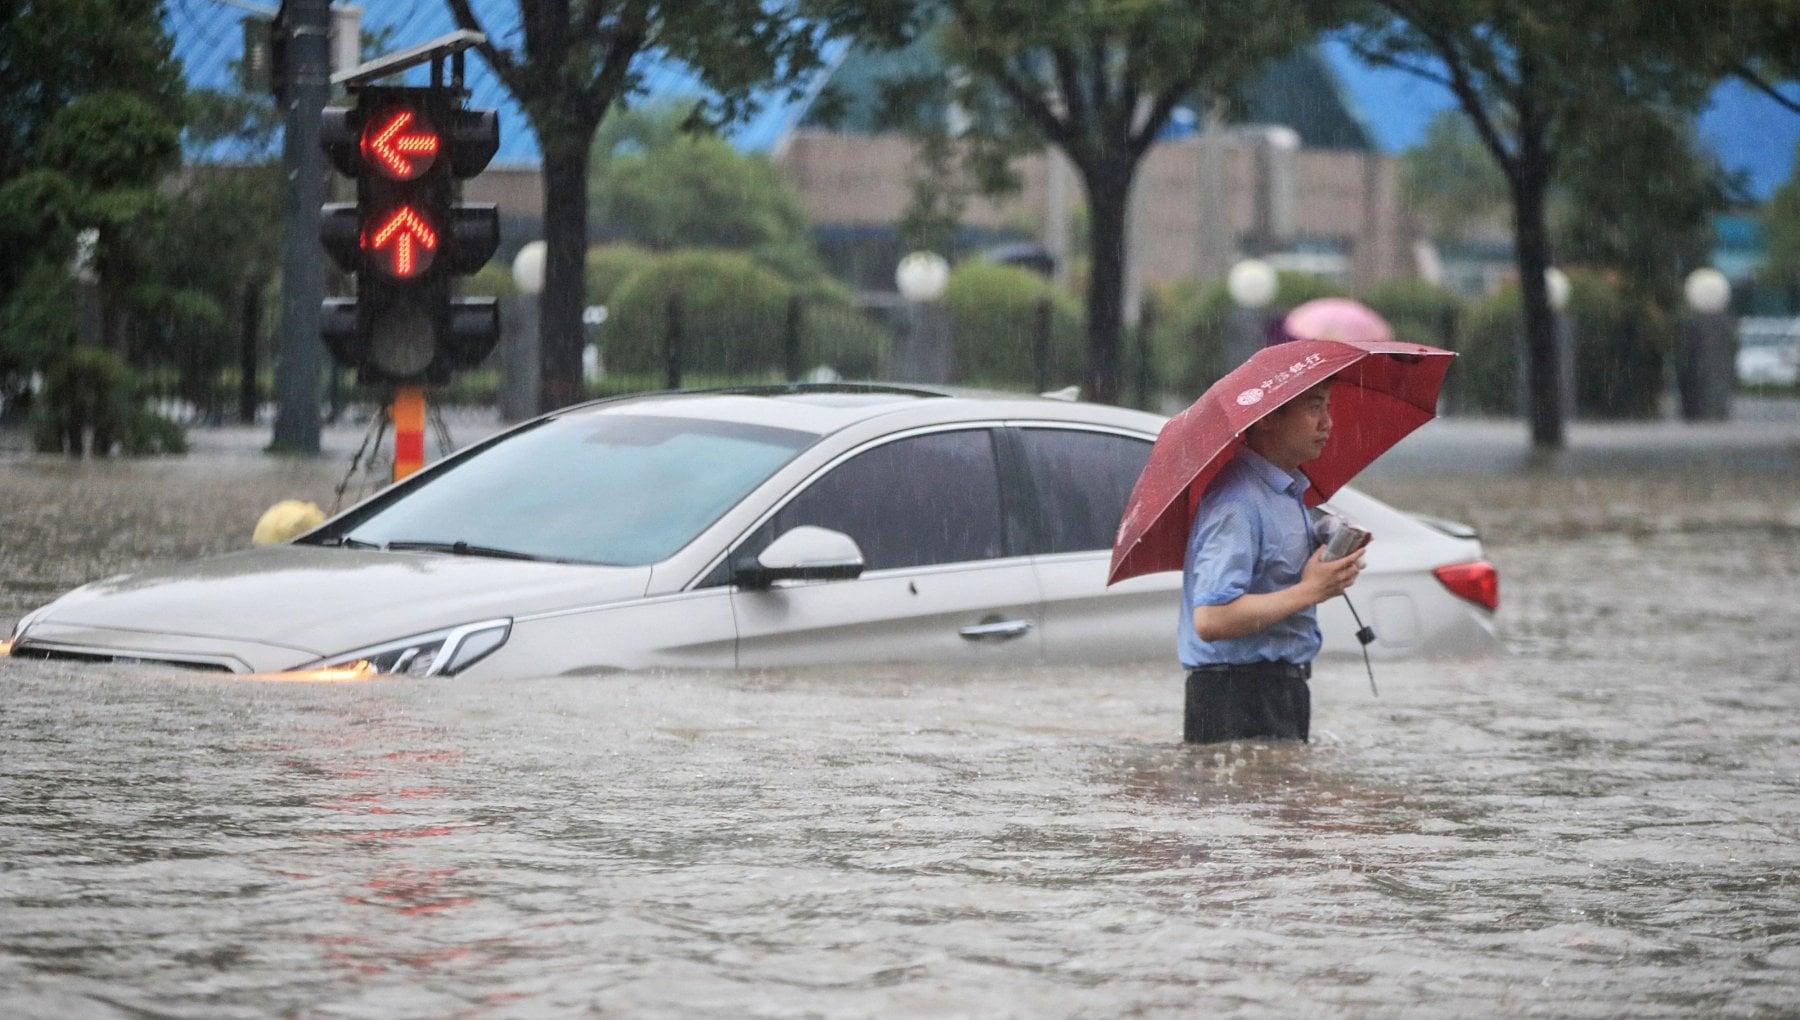 062651432 53595ad0 729b 4a95 aae3 6d8021cd3ab6 - Clima: emergenza piogge in Cina, 10mila evacuati e 12 morti